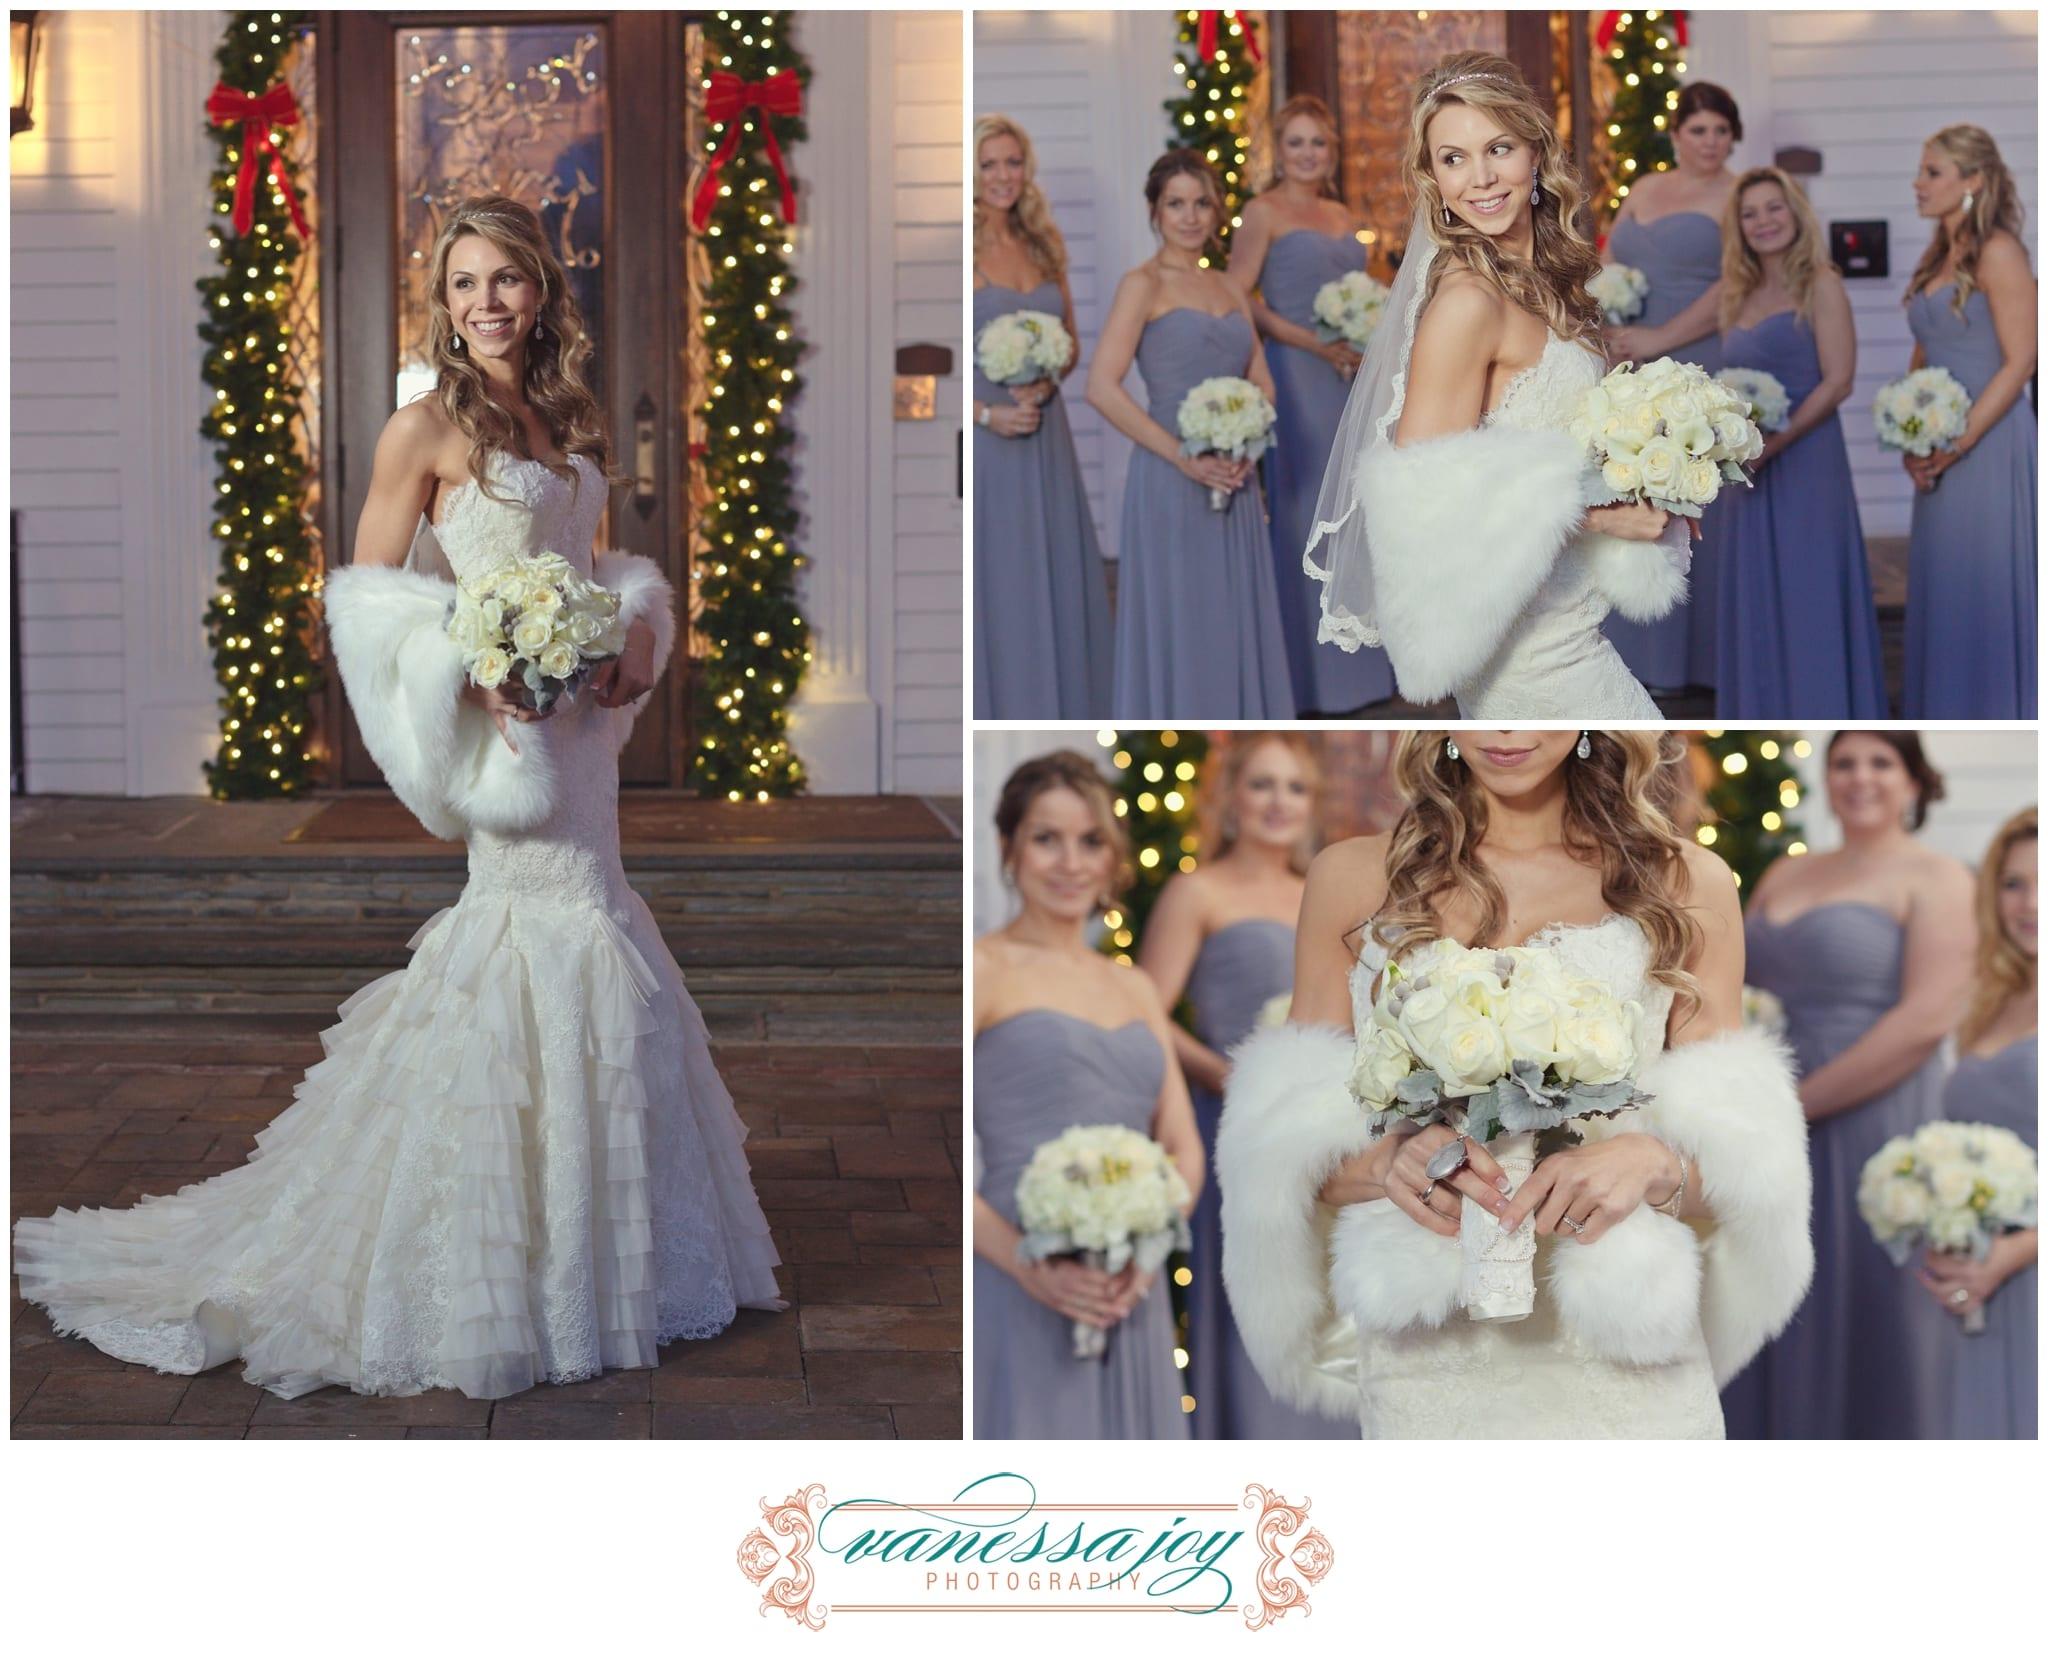 Winter Wedding photos by Vanessa Joy Photography